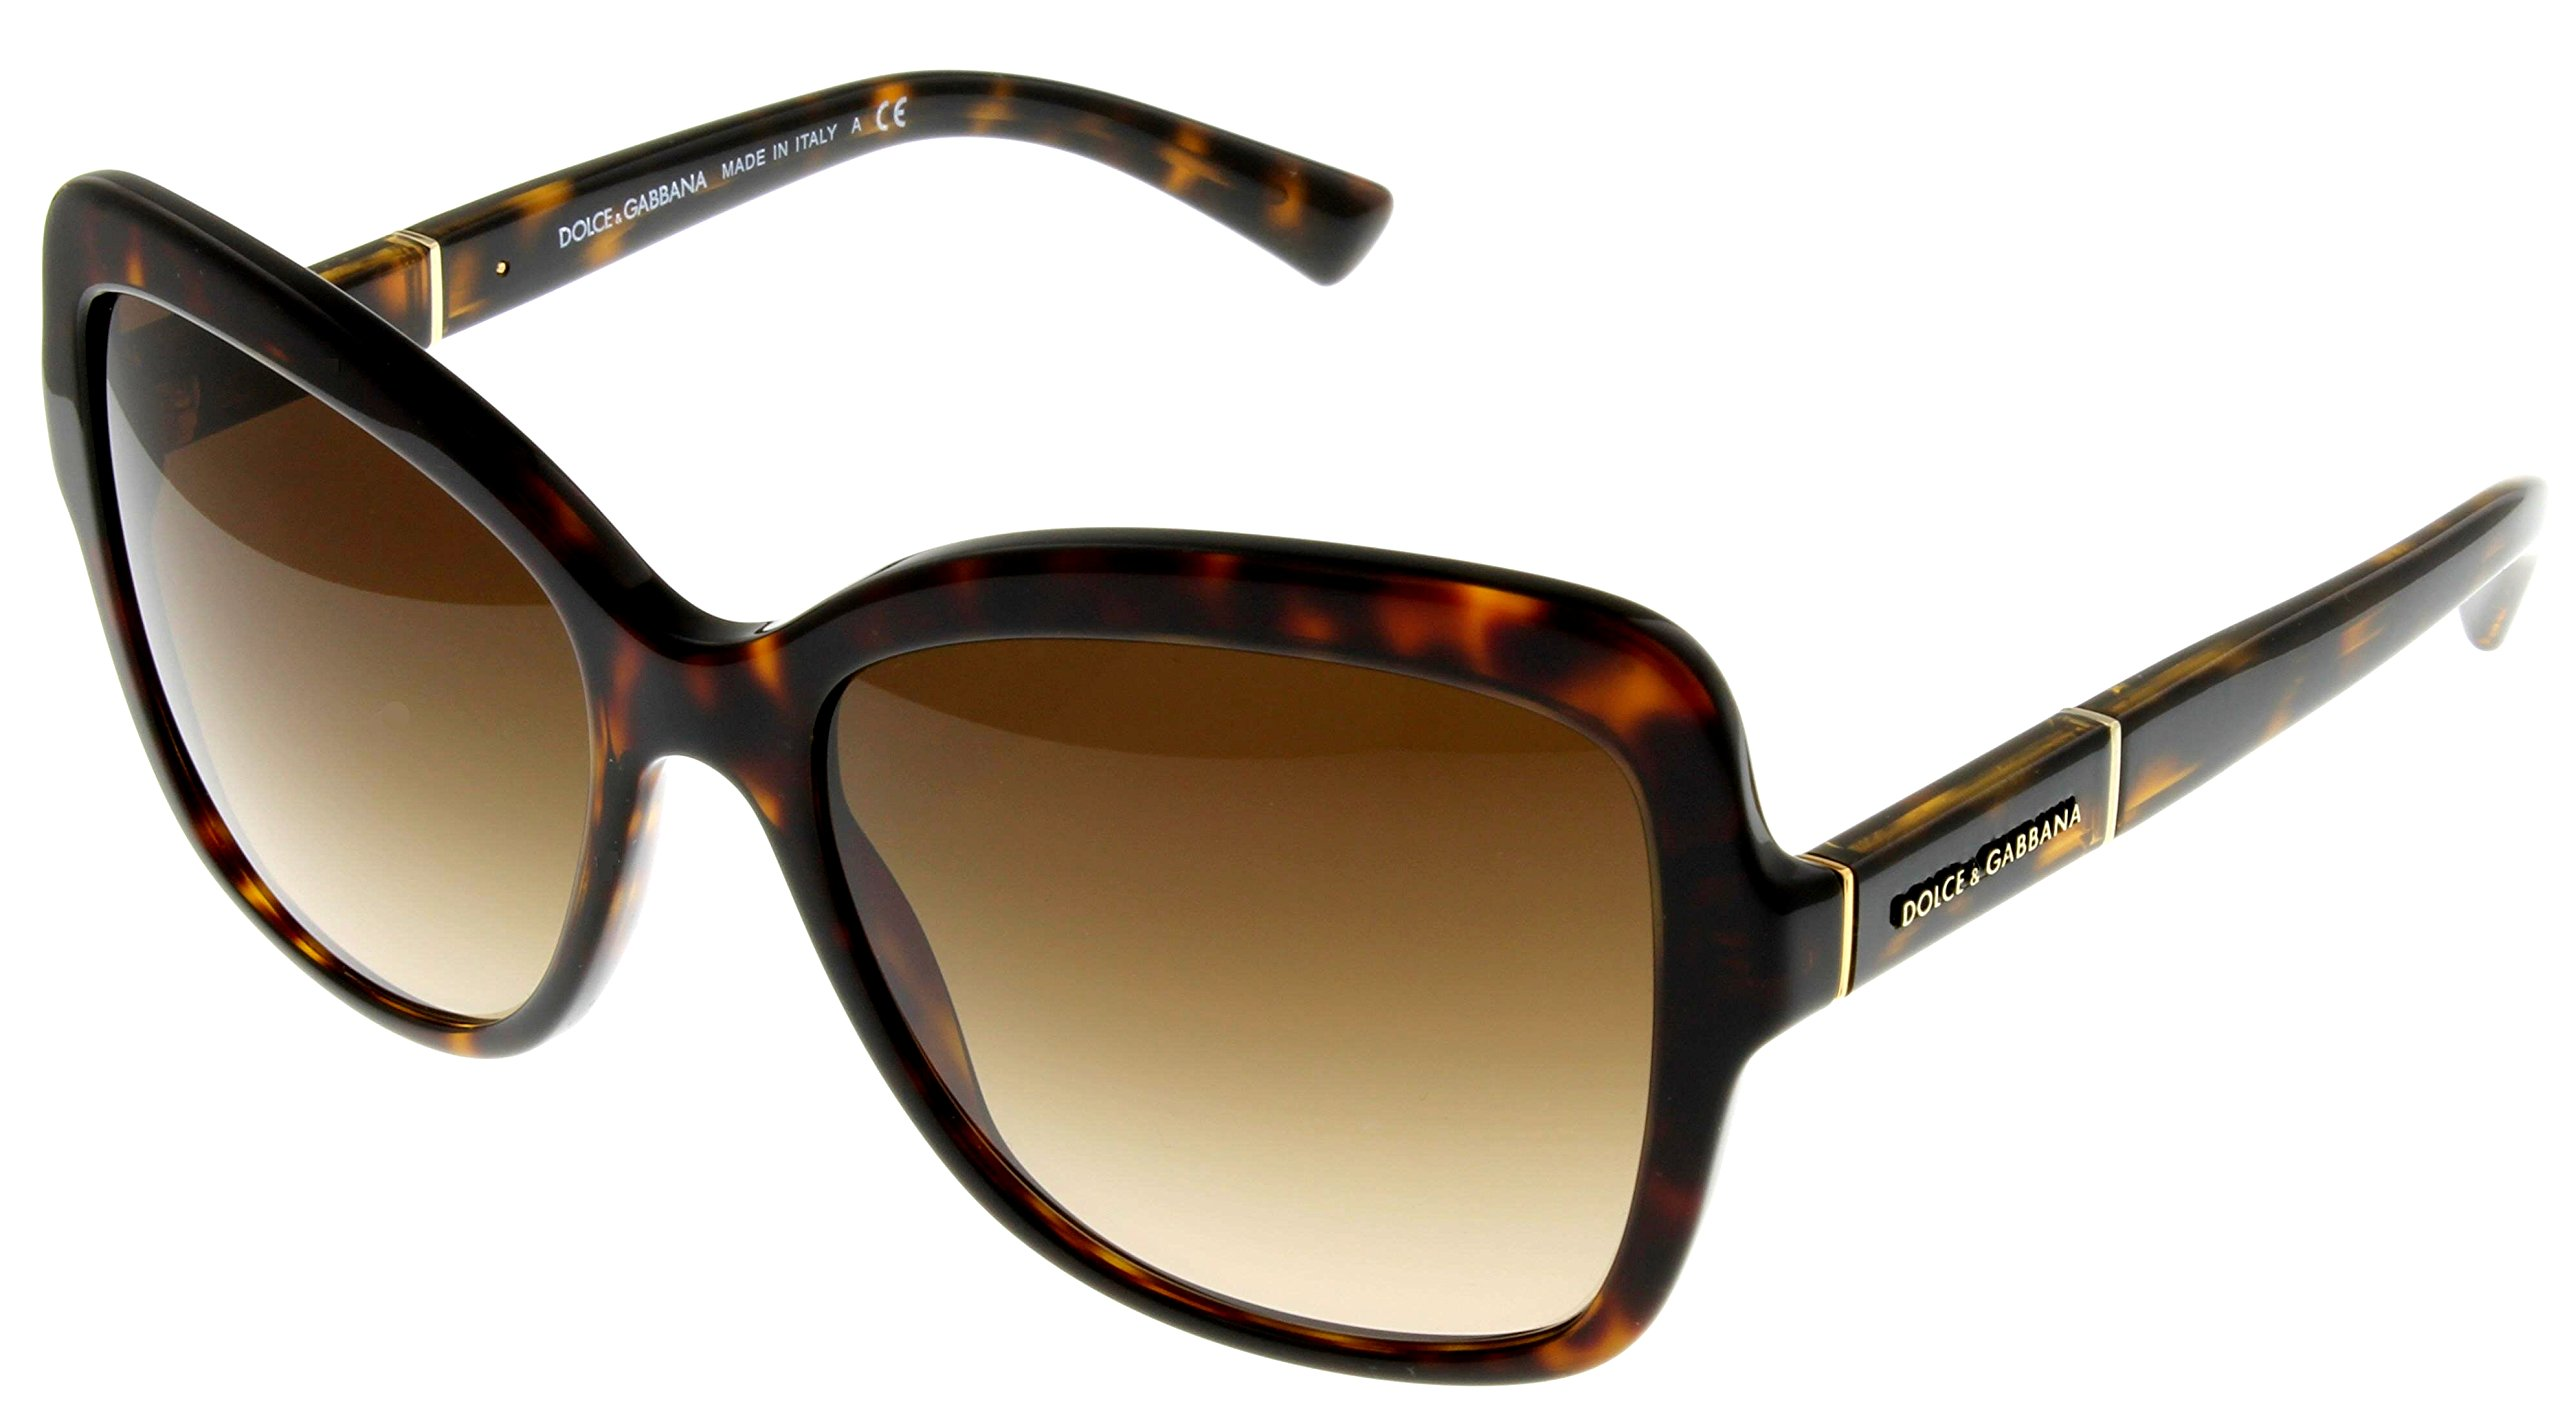 Dolce & Gabbana Sunglasses Women Havana Square DG4244 502/13